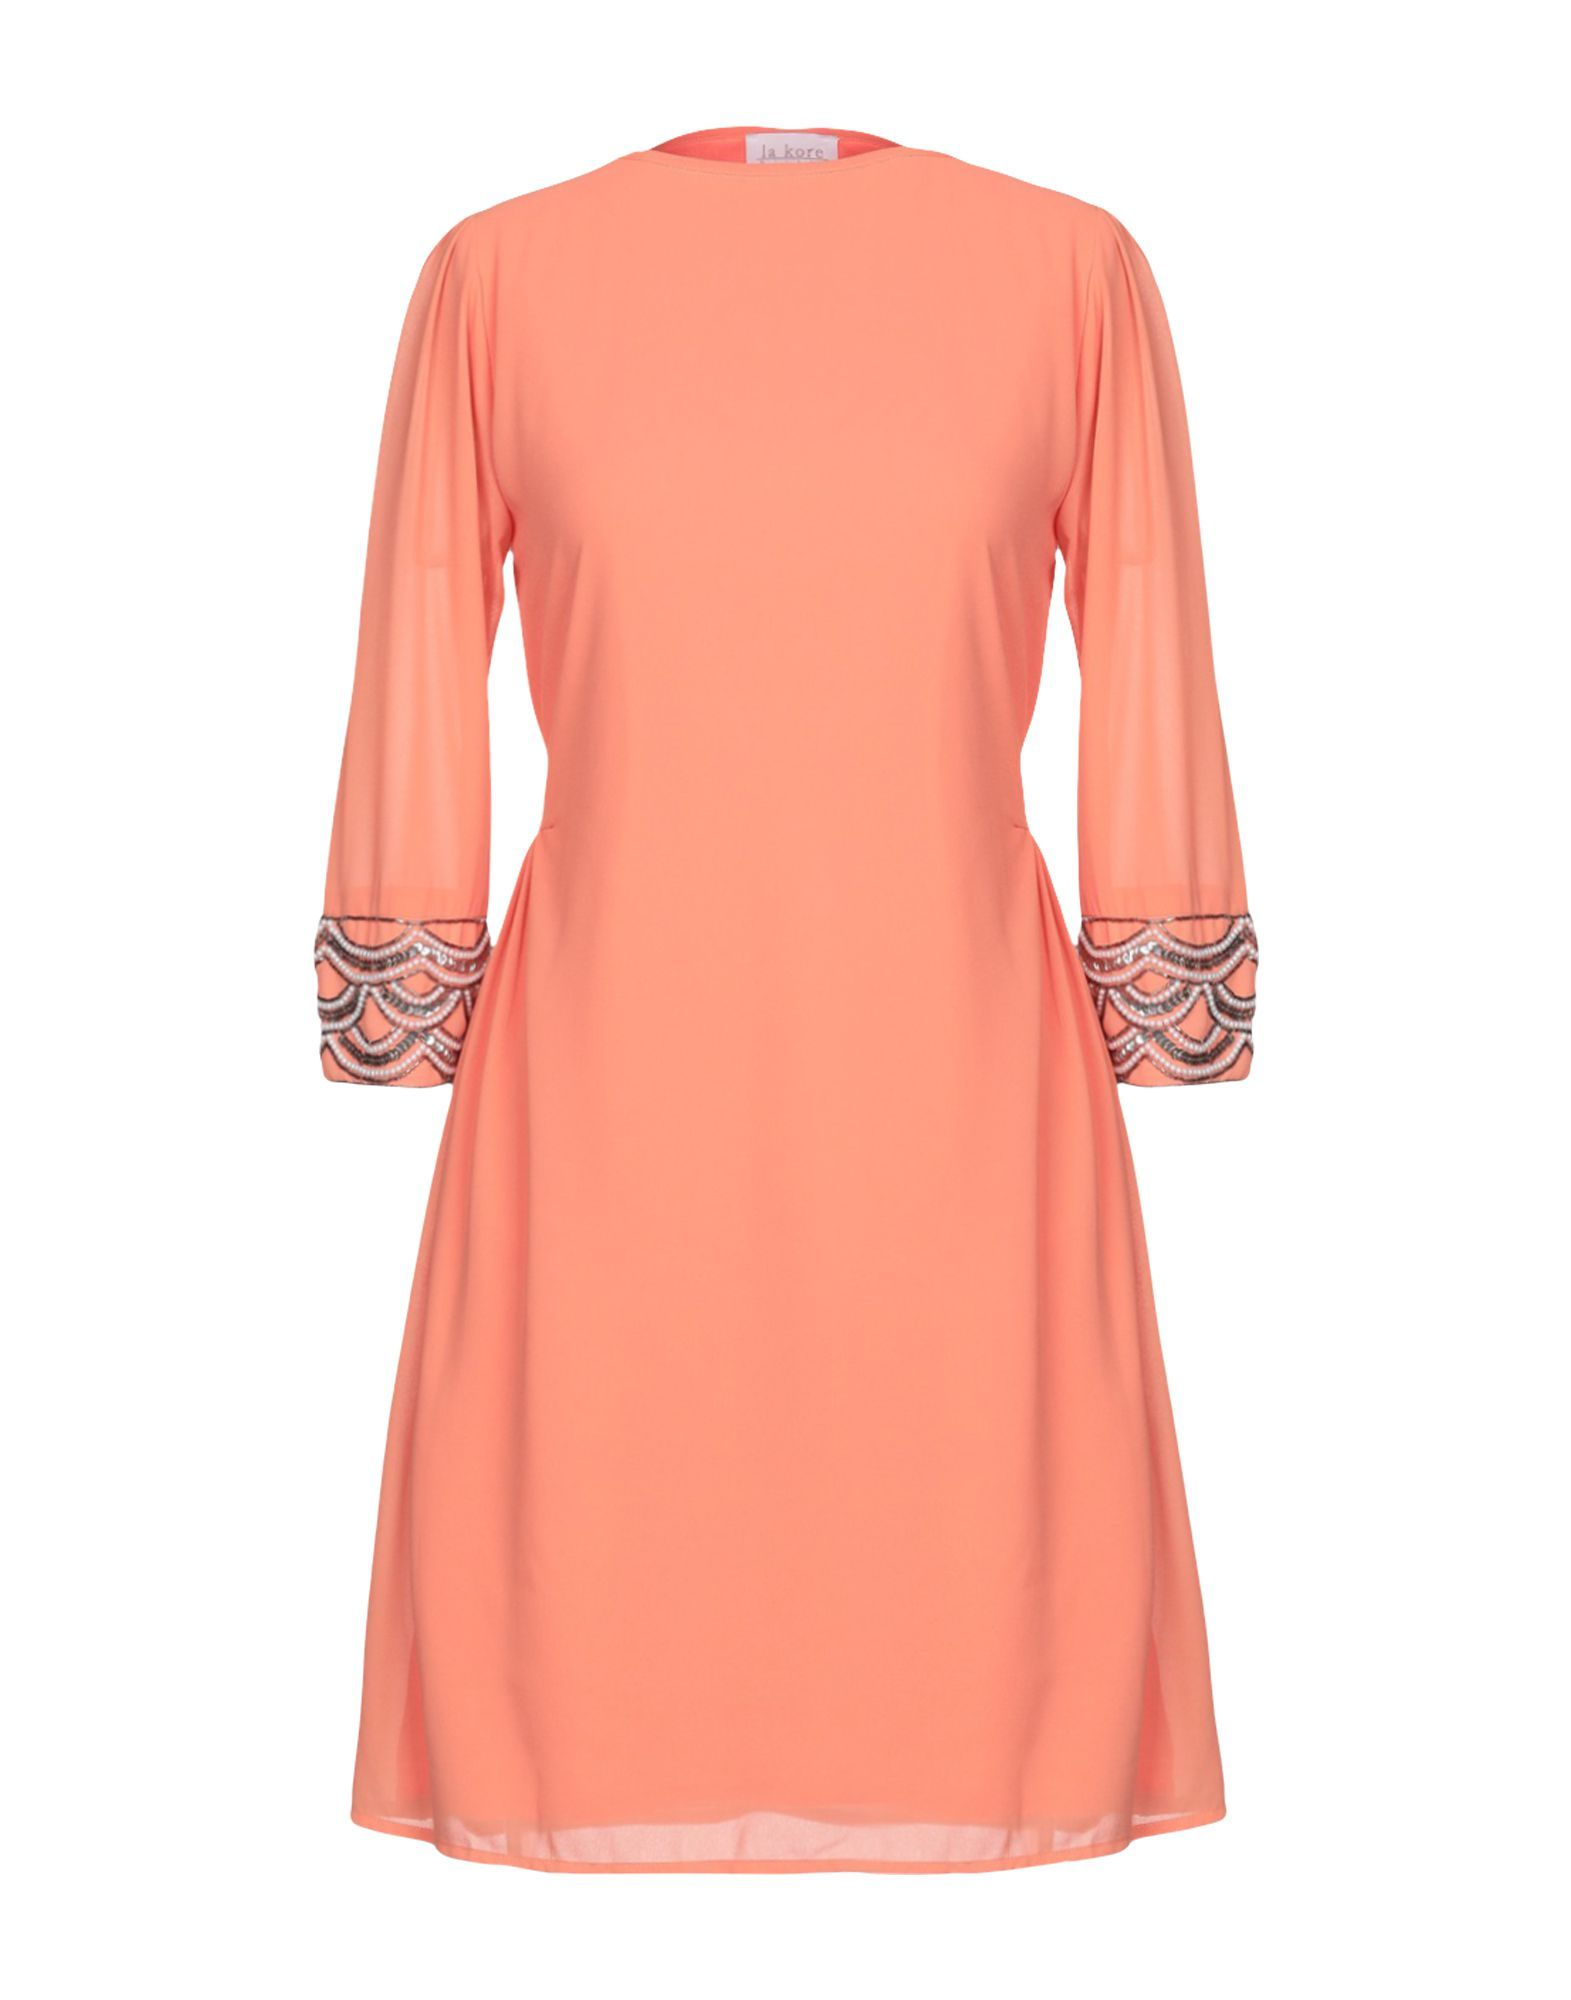 La Kore Salmon Pink Embellished Dress